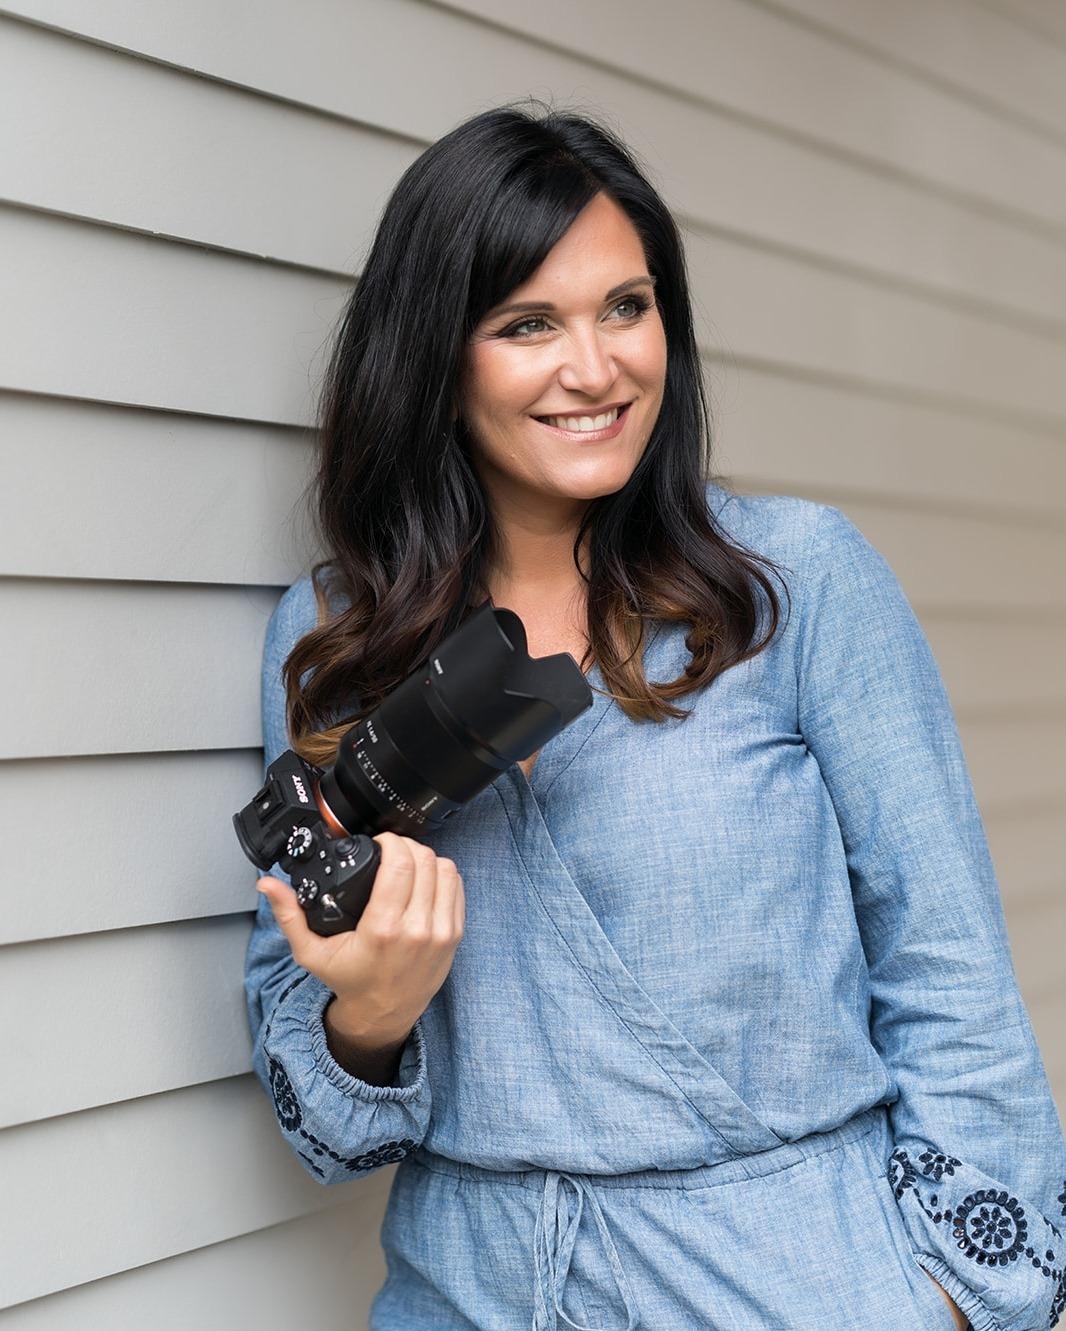 A portrait of Sara France holding a Sony  camera